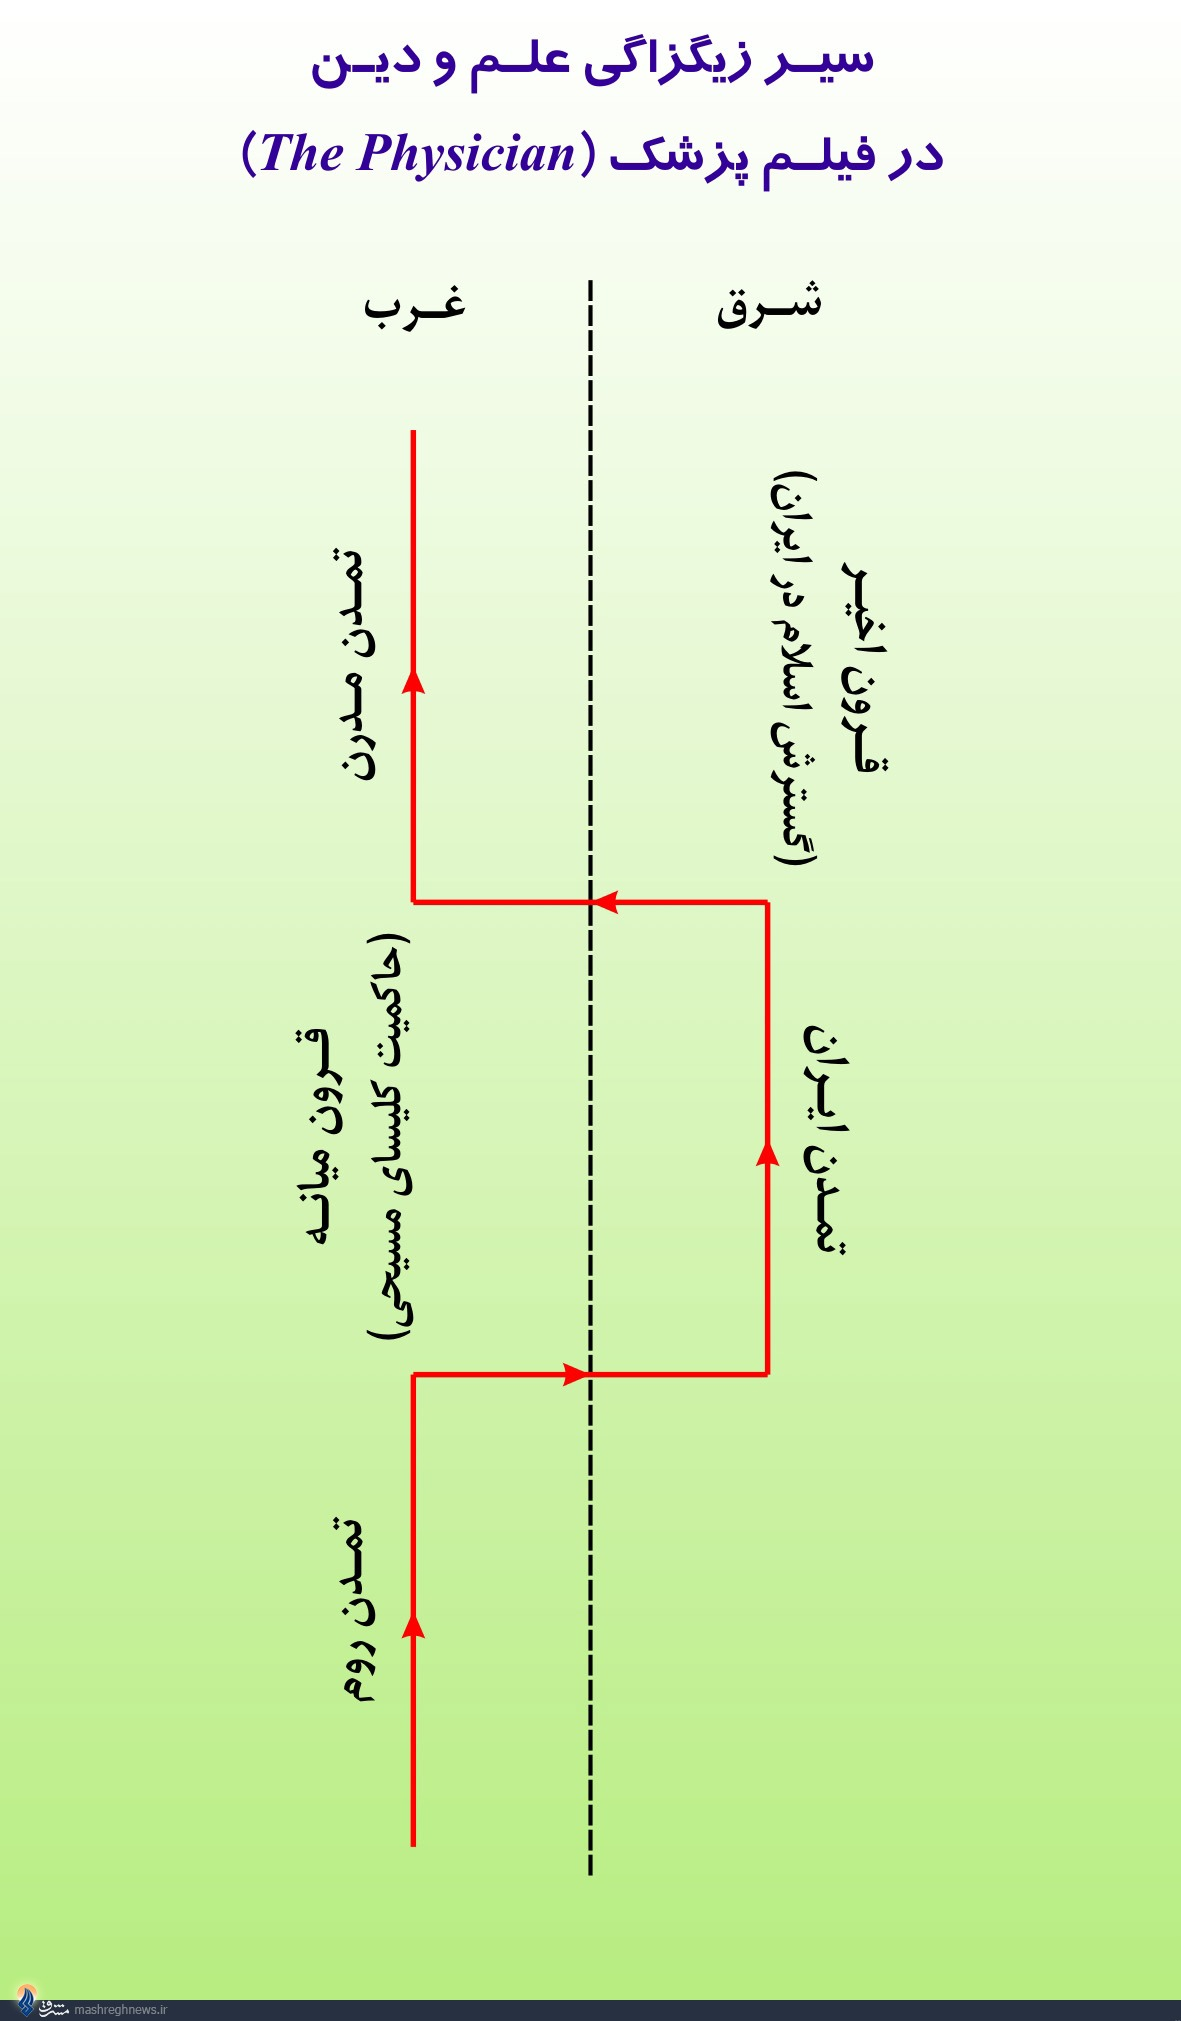 http://buali.ir/buali_content/media/image/2016/09/1413_orig.jpg